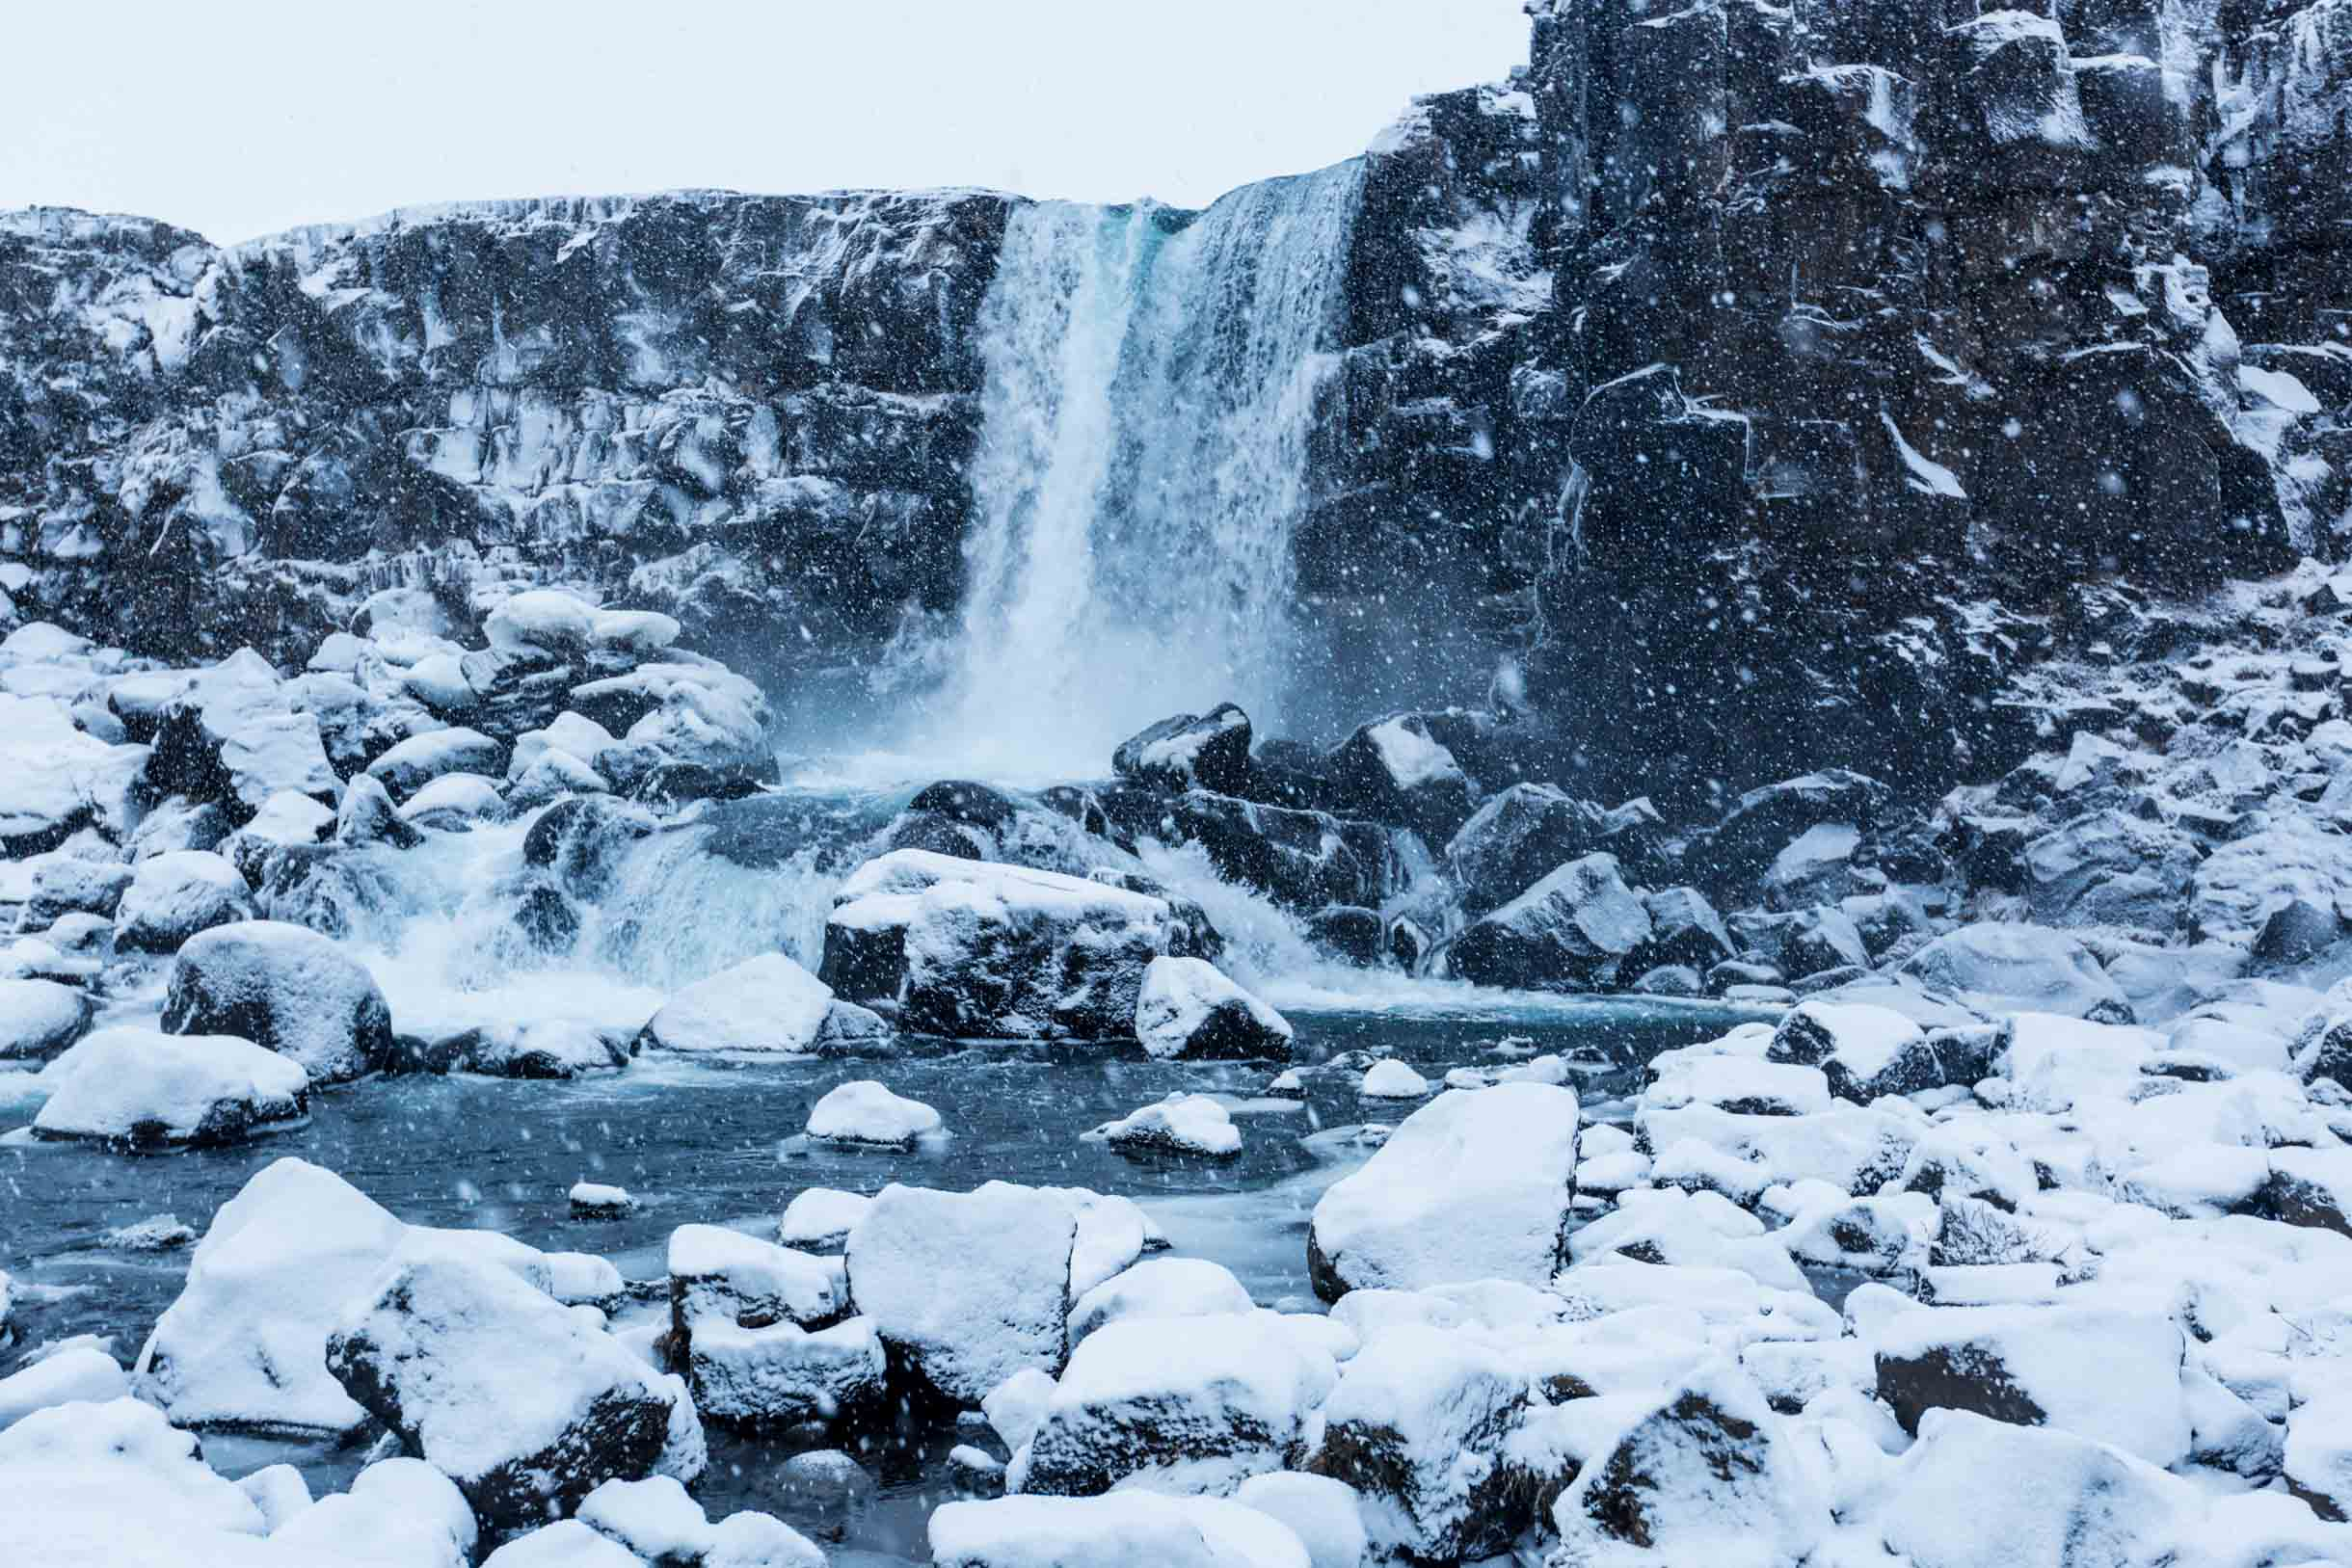 oxarafoss waterfall Thingvellir National Park